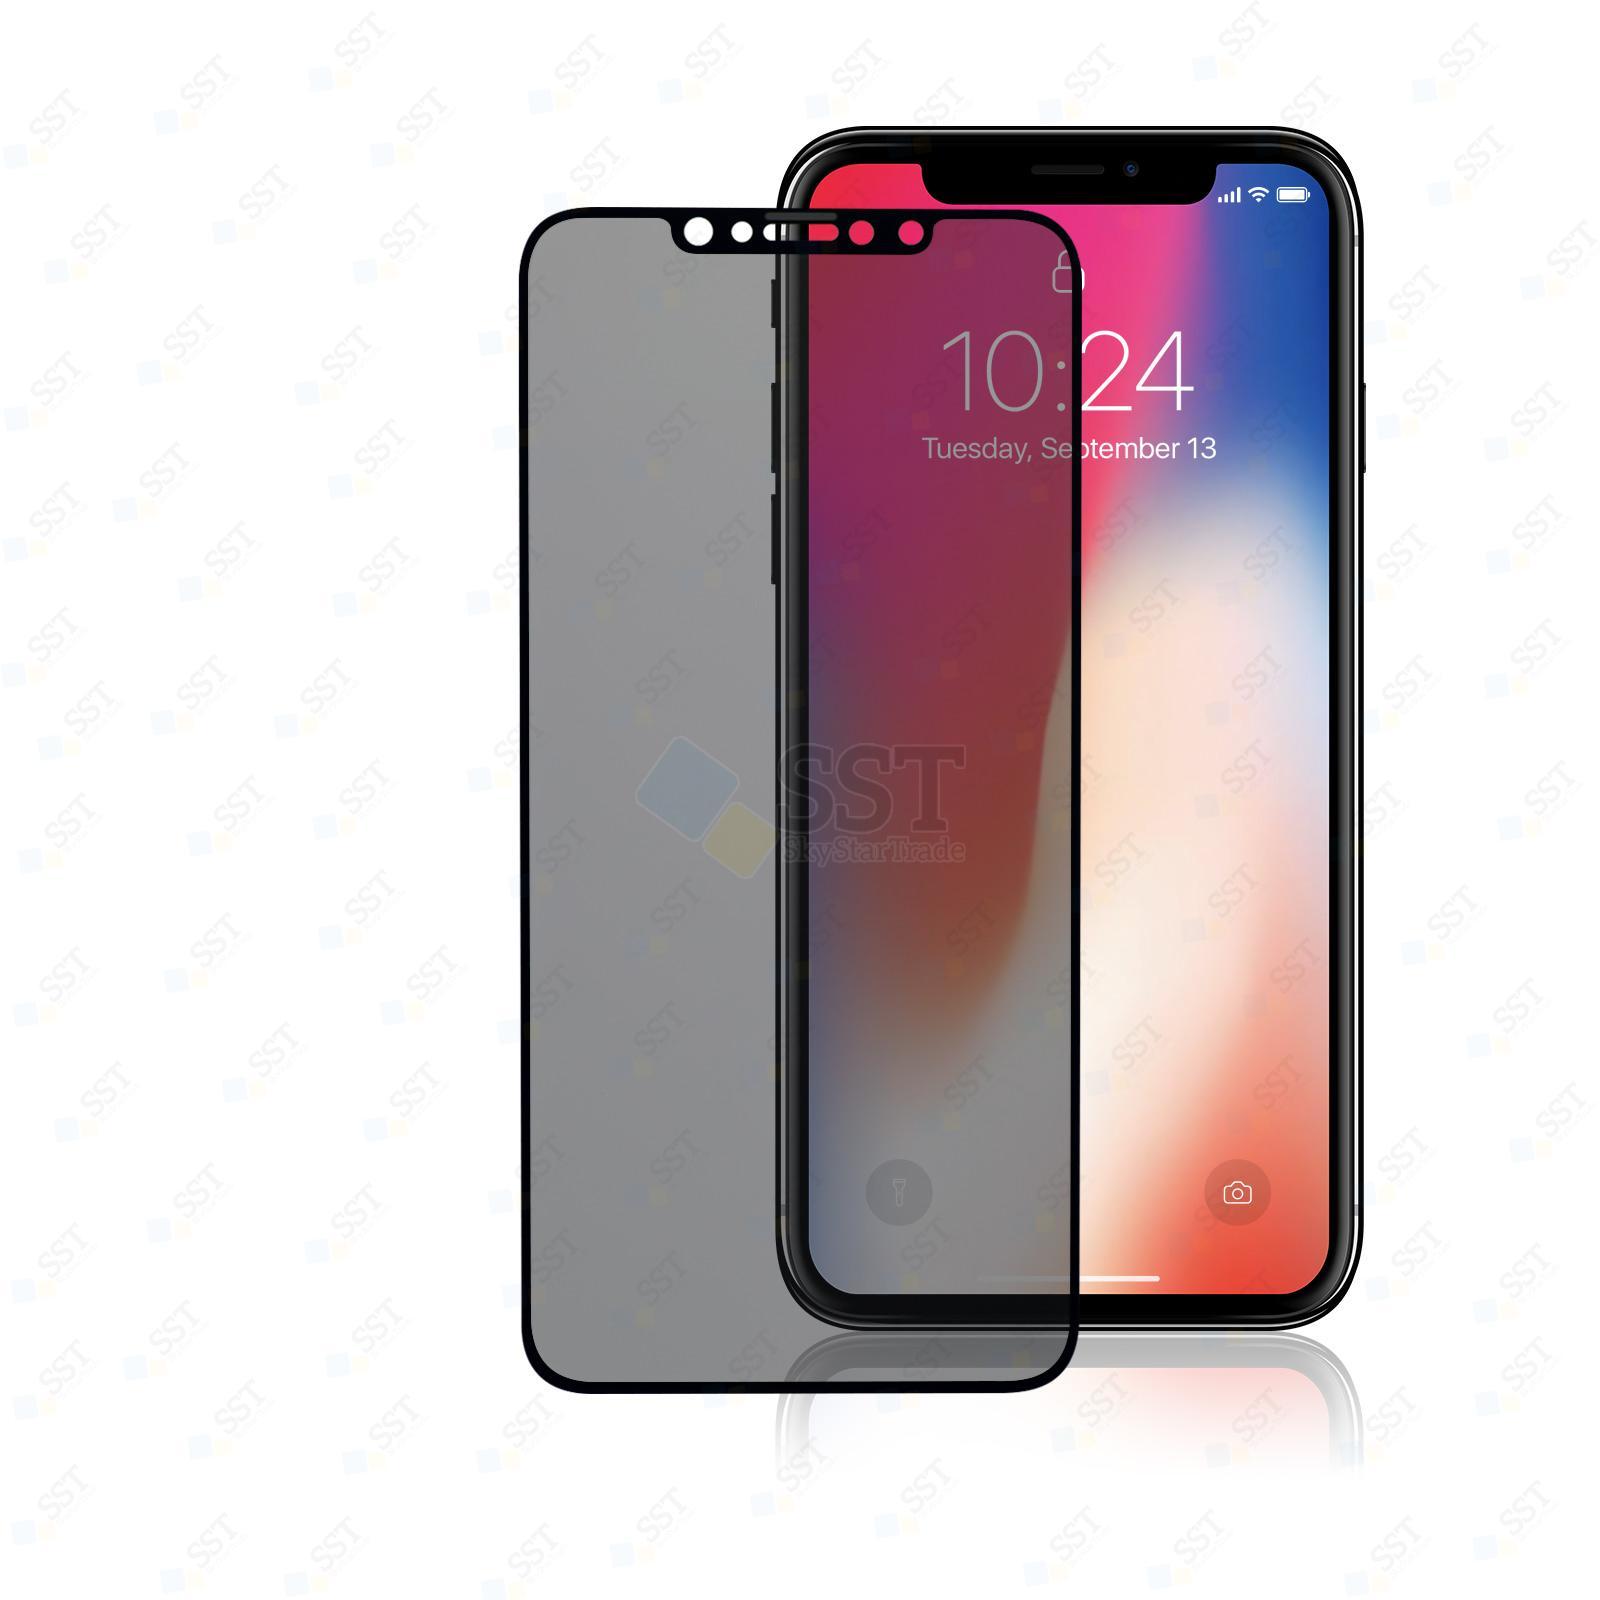 iPhone XS Max A1921 A2101 A2102 A2103 A2104, 11 Pro Max A2161 A2218 A2220 Privacy Anti-Spy Premium Tempered Glass Screen Protector Guard, Black